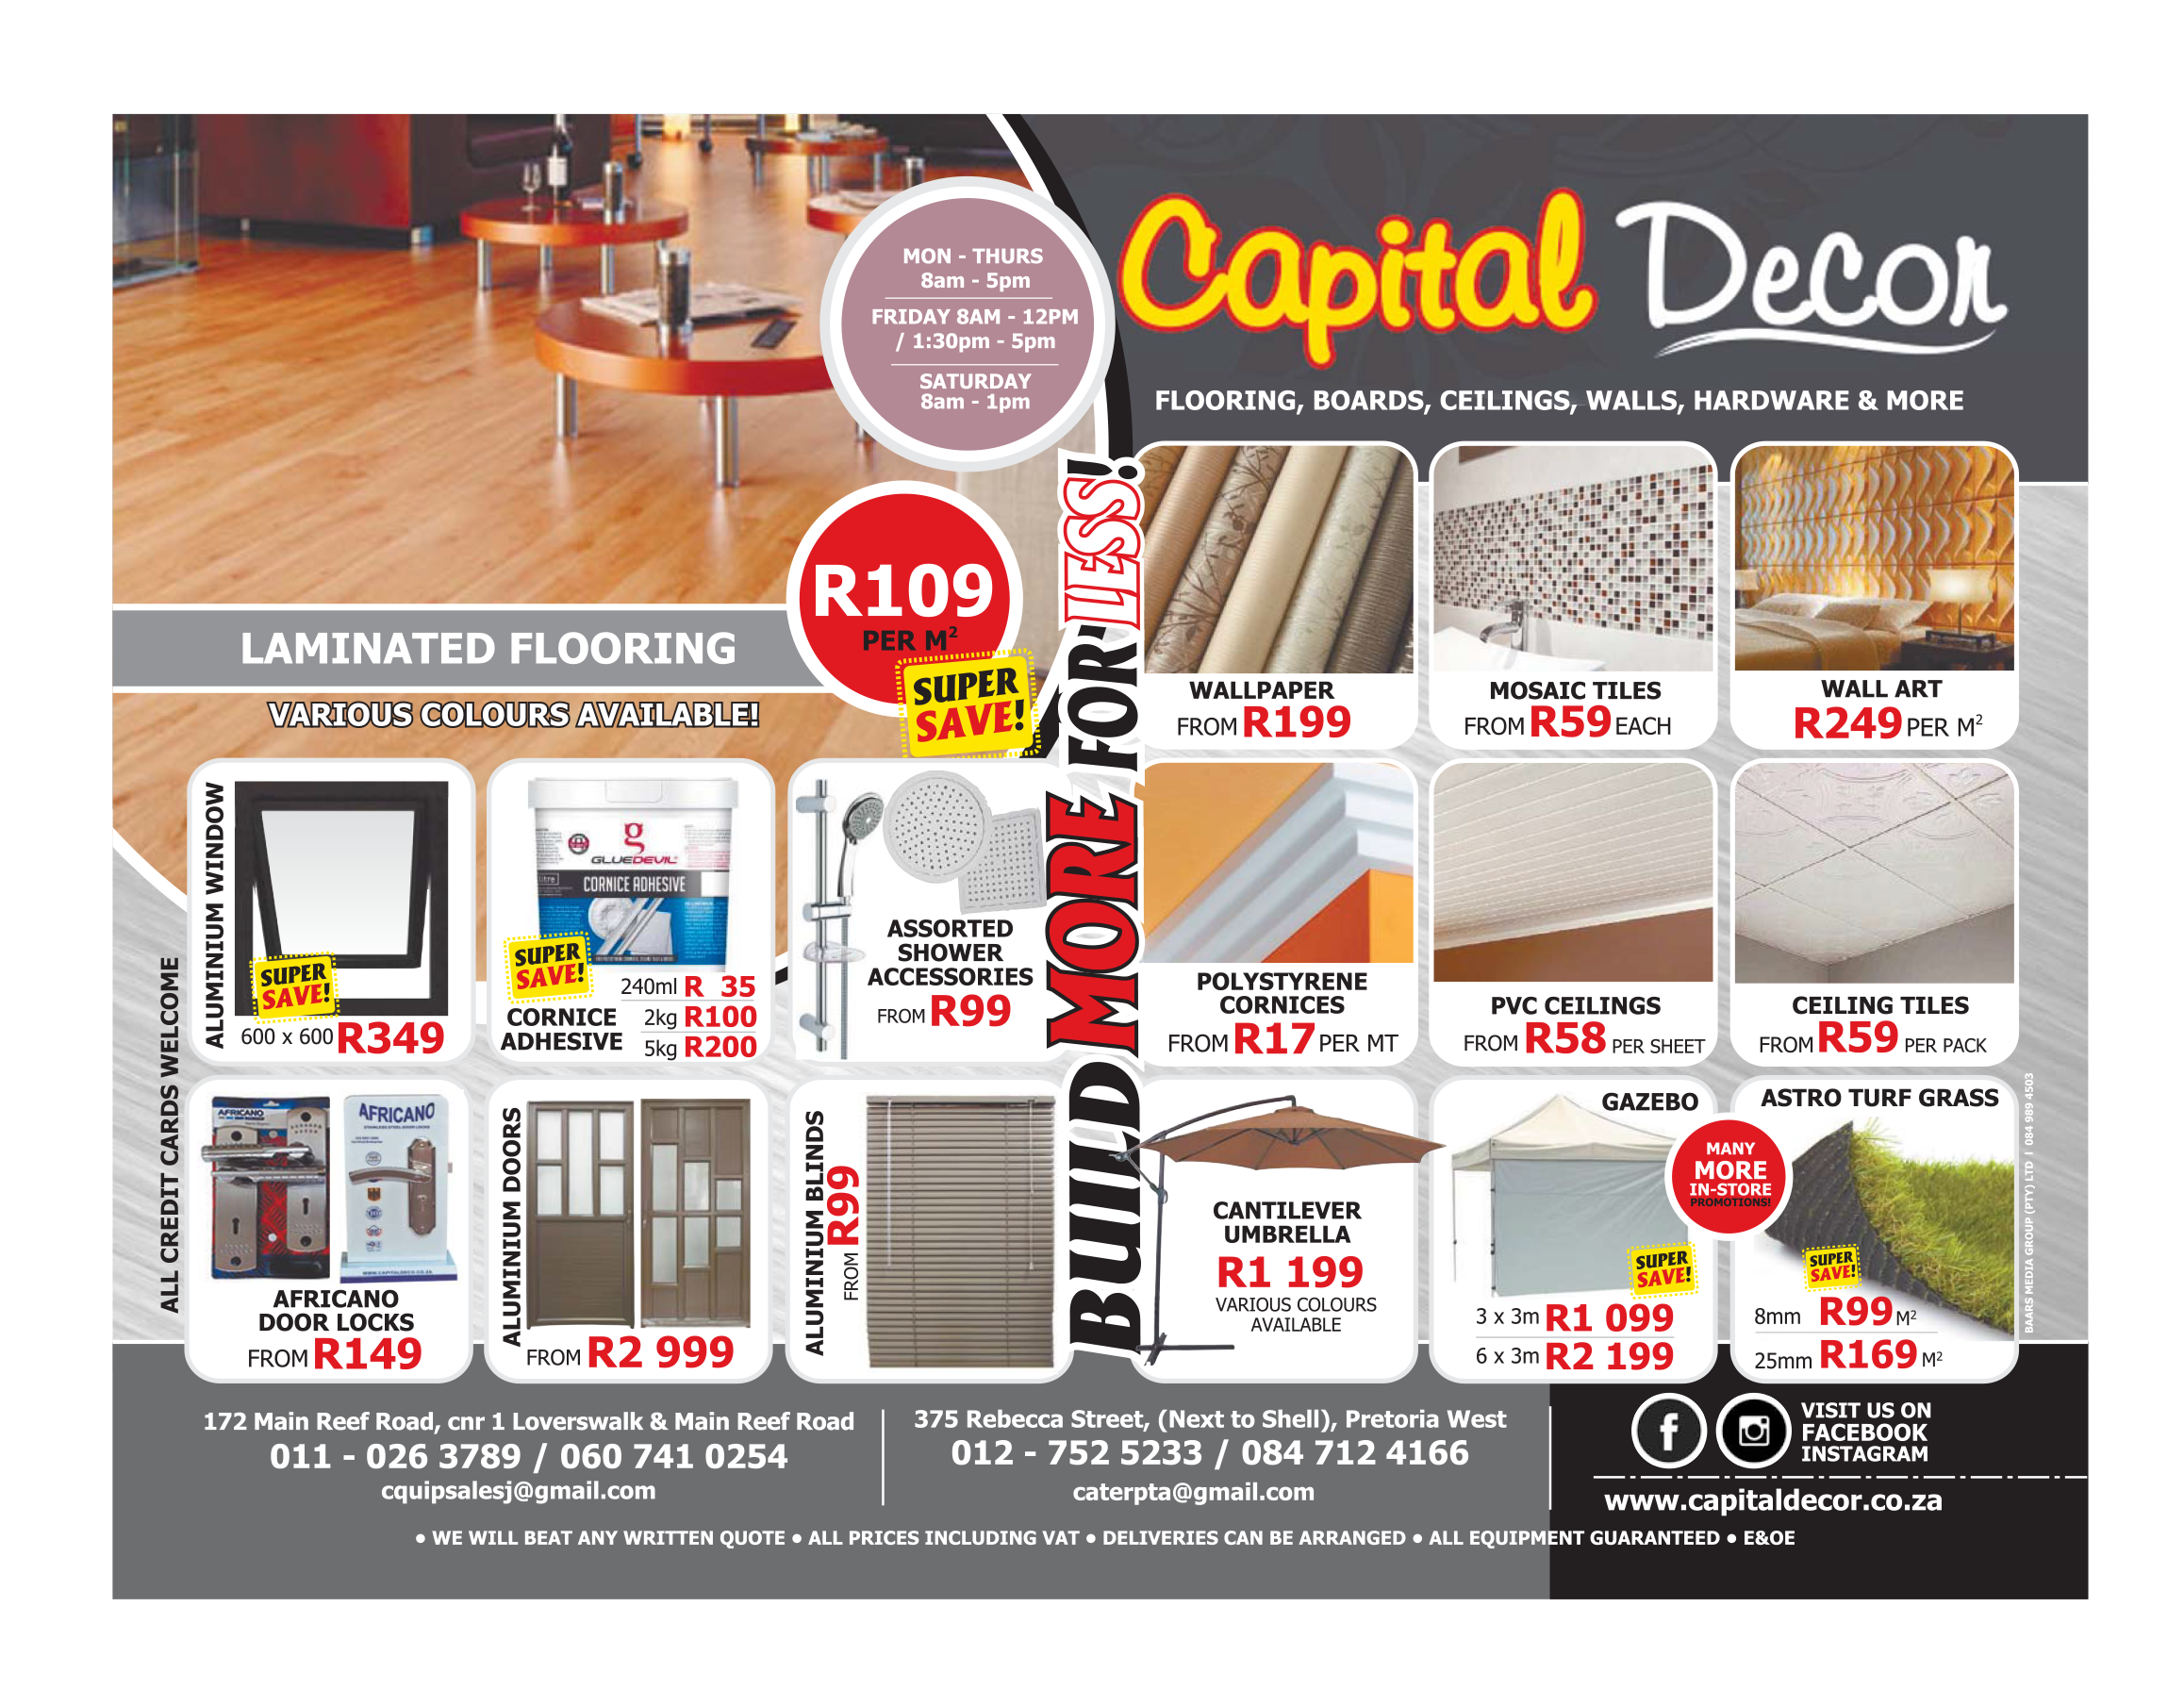 Capital Decor